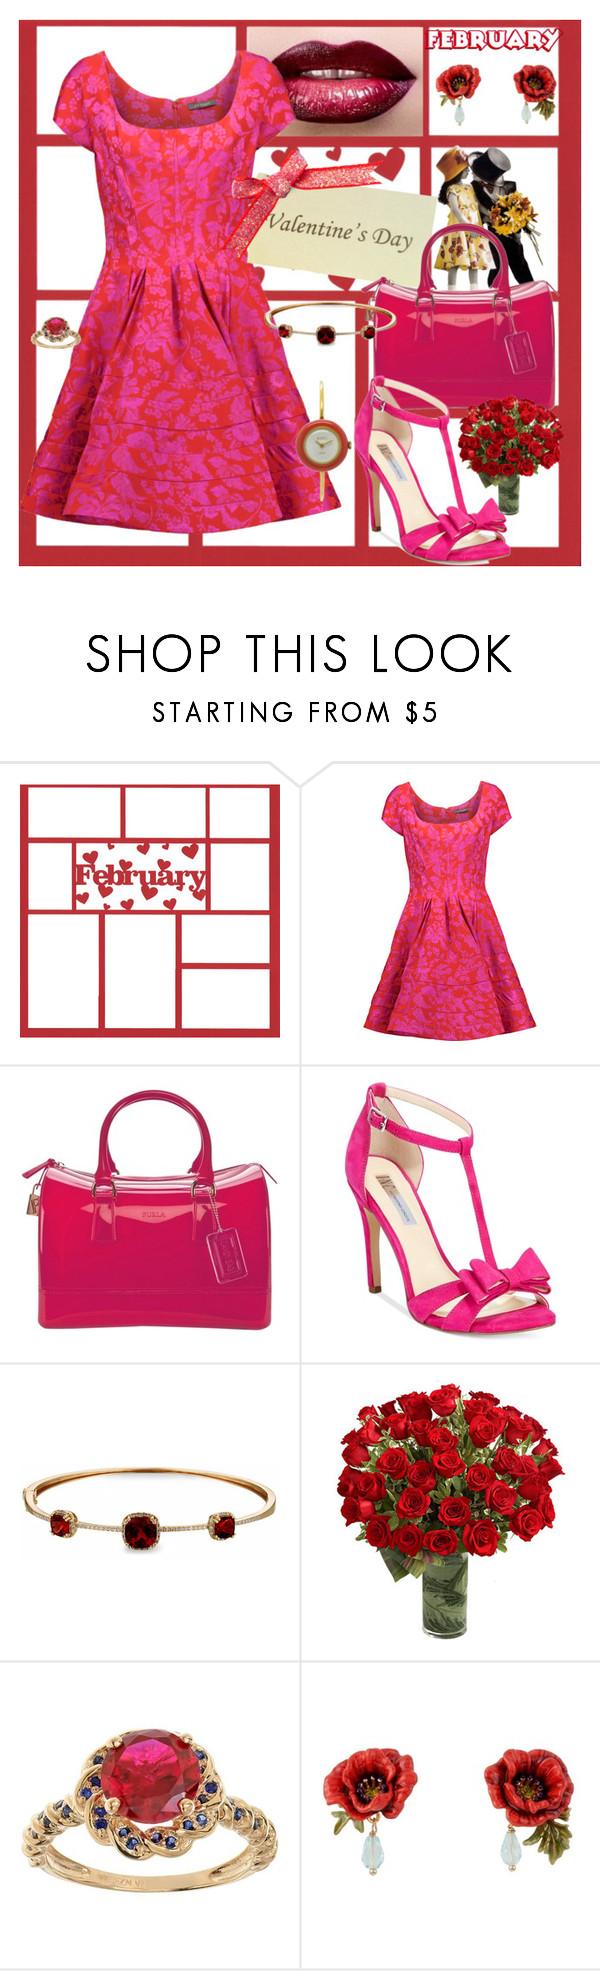 """Zac Posen Valentine's day Dress"" by stephaniedsmigo ❤ liked on Polyvore featuring Zac Posen, Furla, INC International Concepts, Dabakarov, Les Néréides and Gucci"